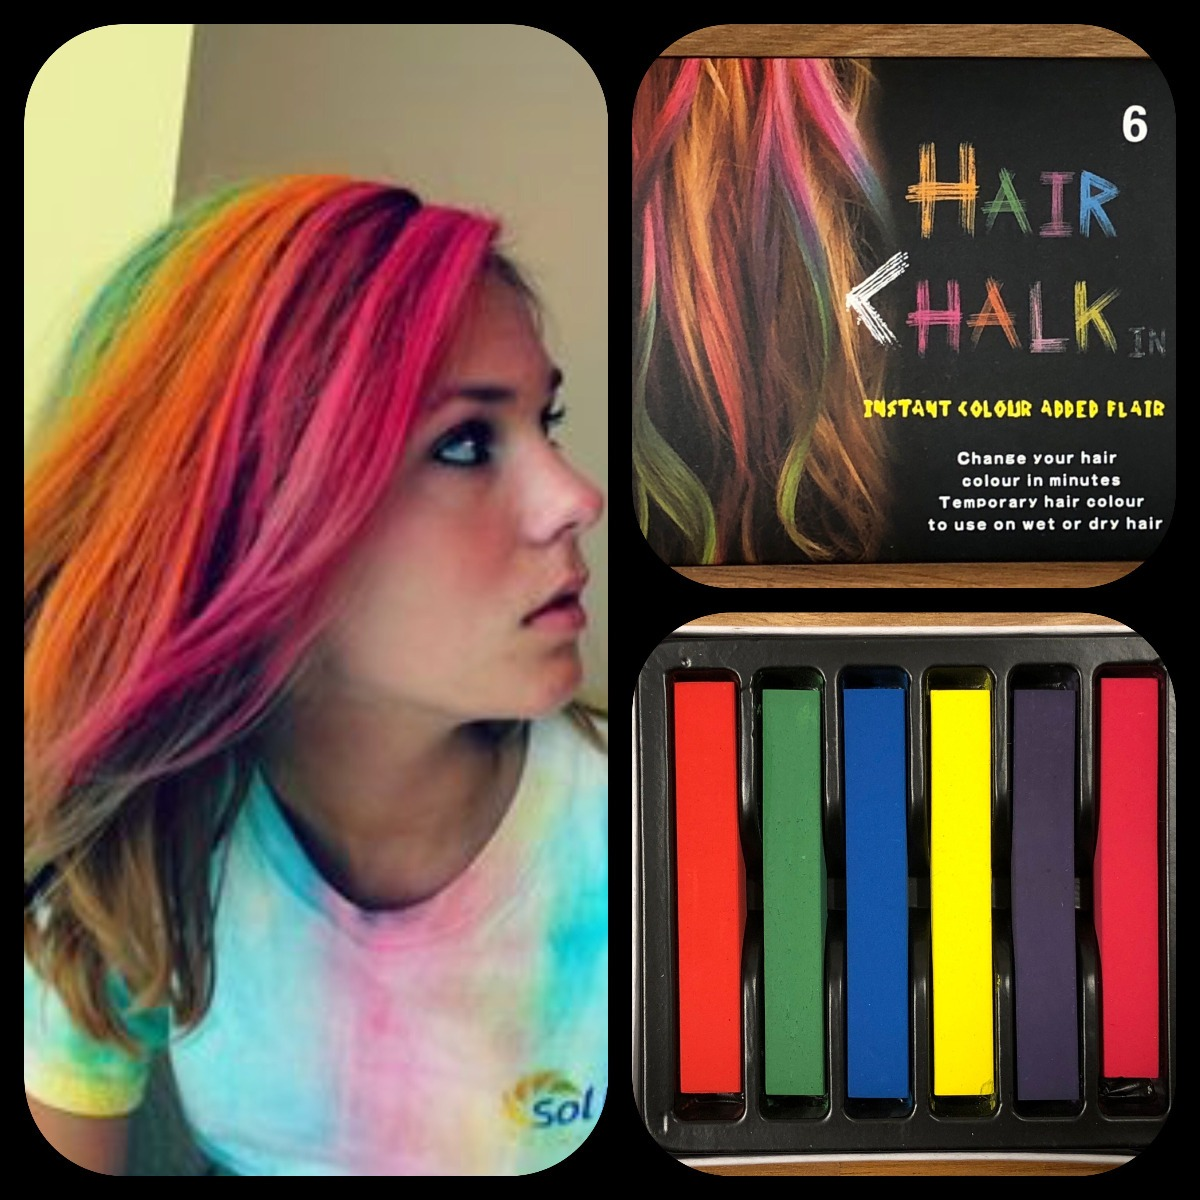 577fedb5e Tizas Para Pintar Teñir El Pelo Hair Chalk X 6 Unidades - $ 650,00 ...